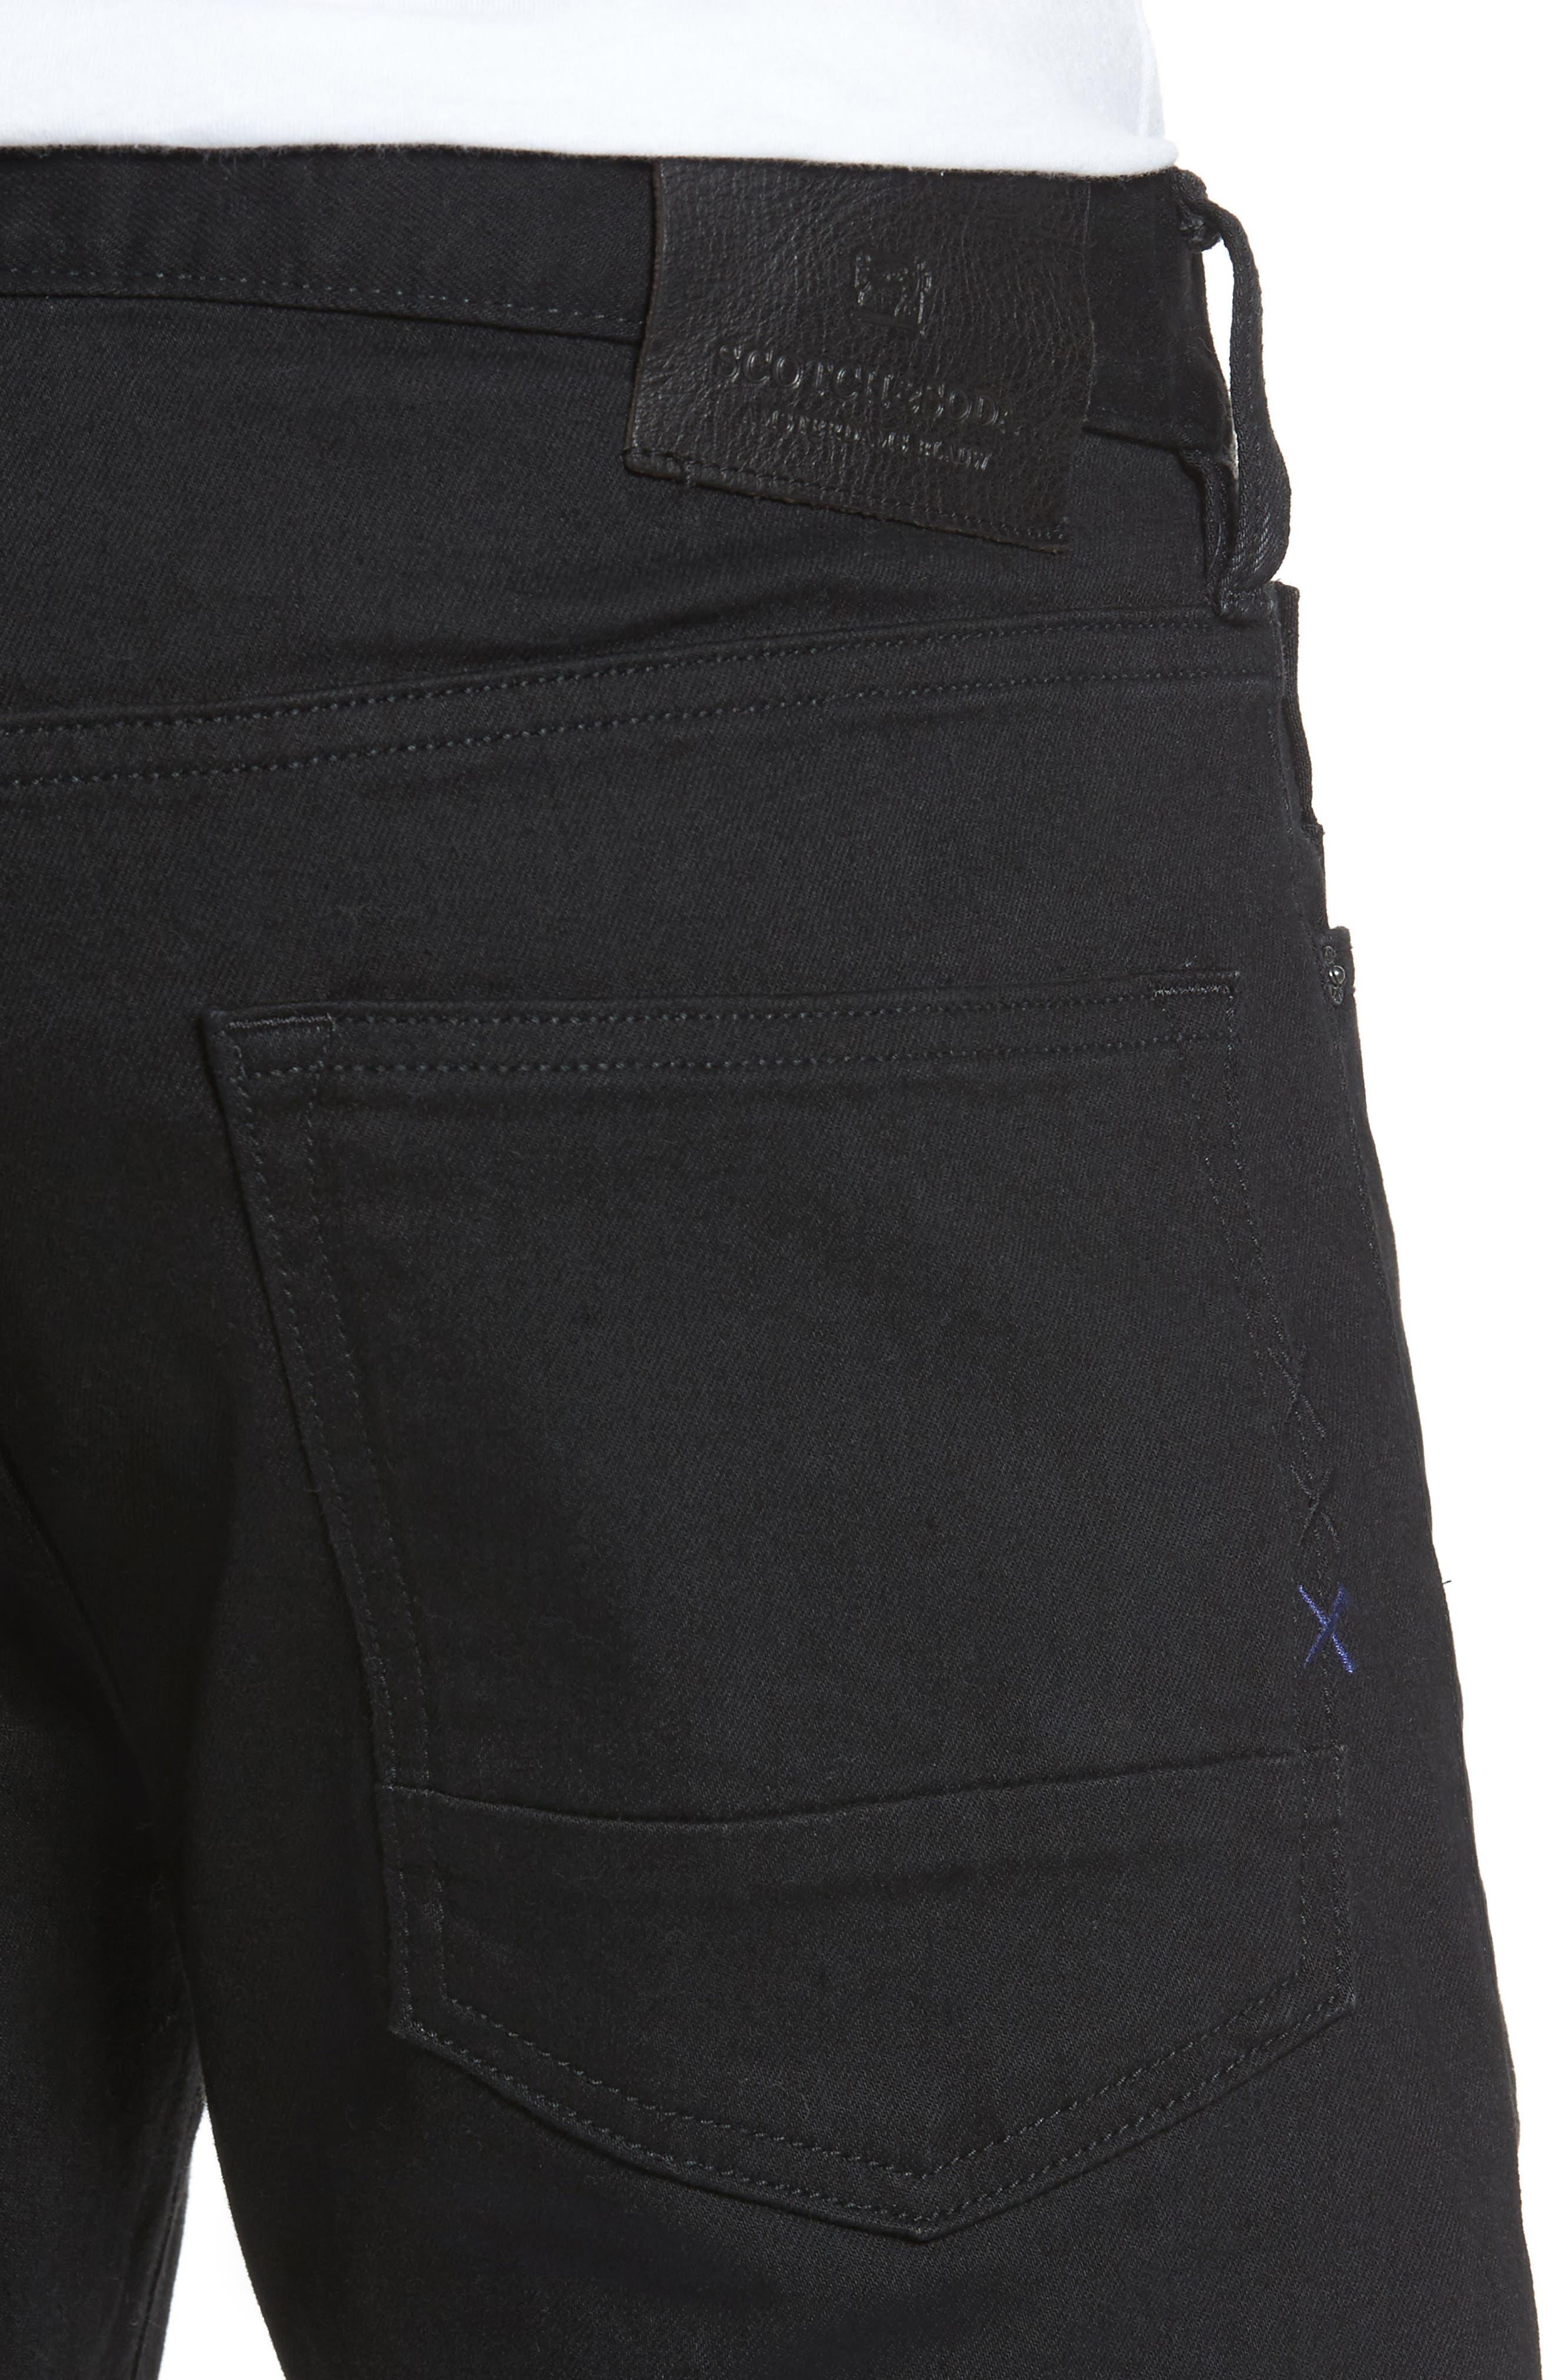 Ralston Slim Straight Leg Jeans,                             Alternate thumbnail 4, color,